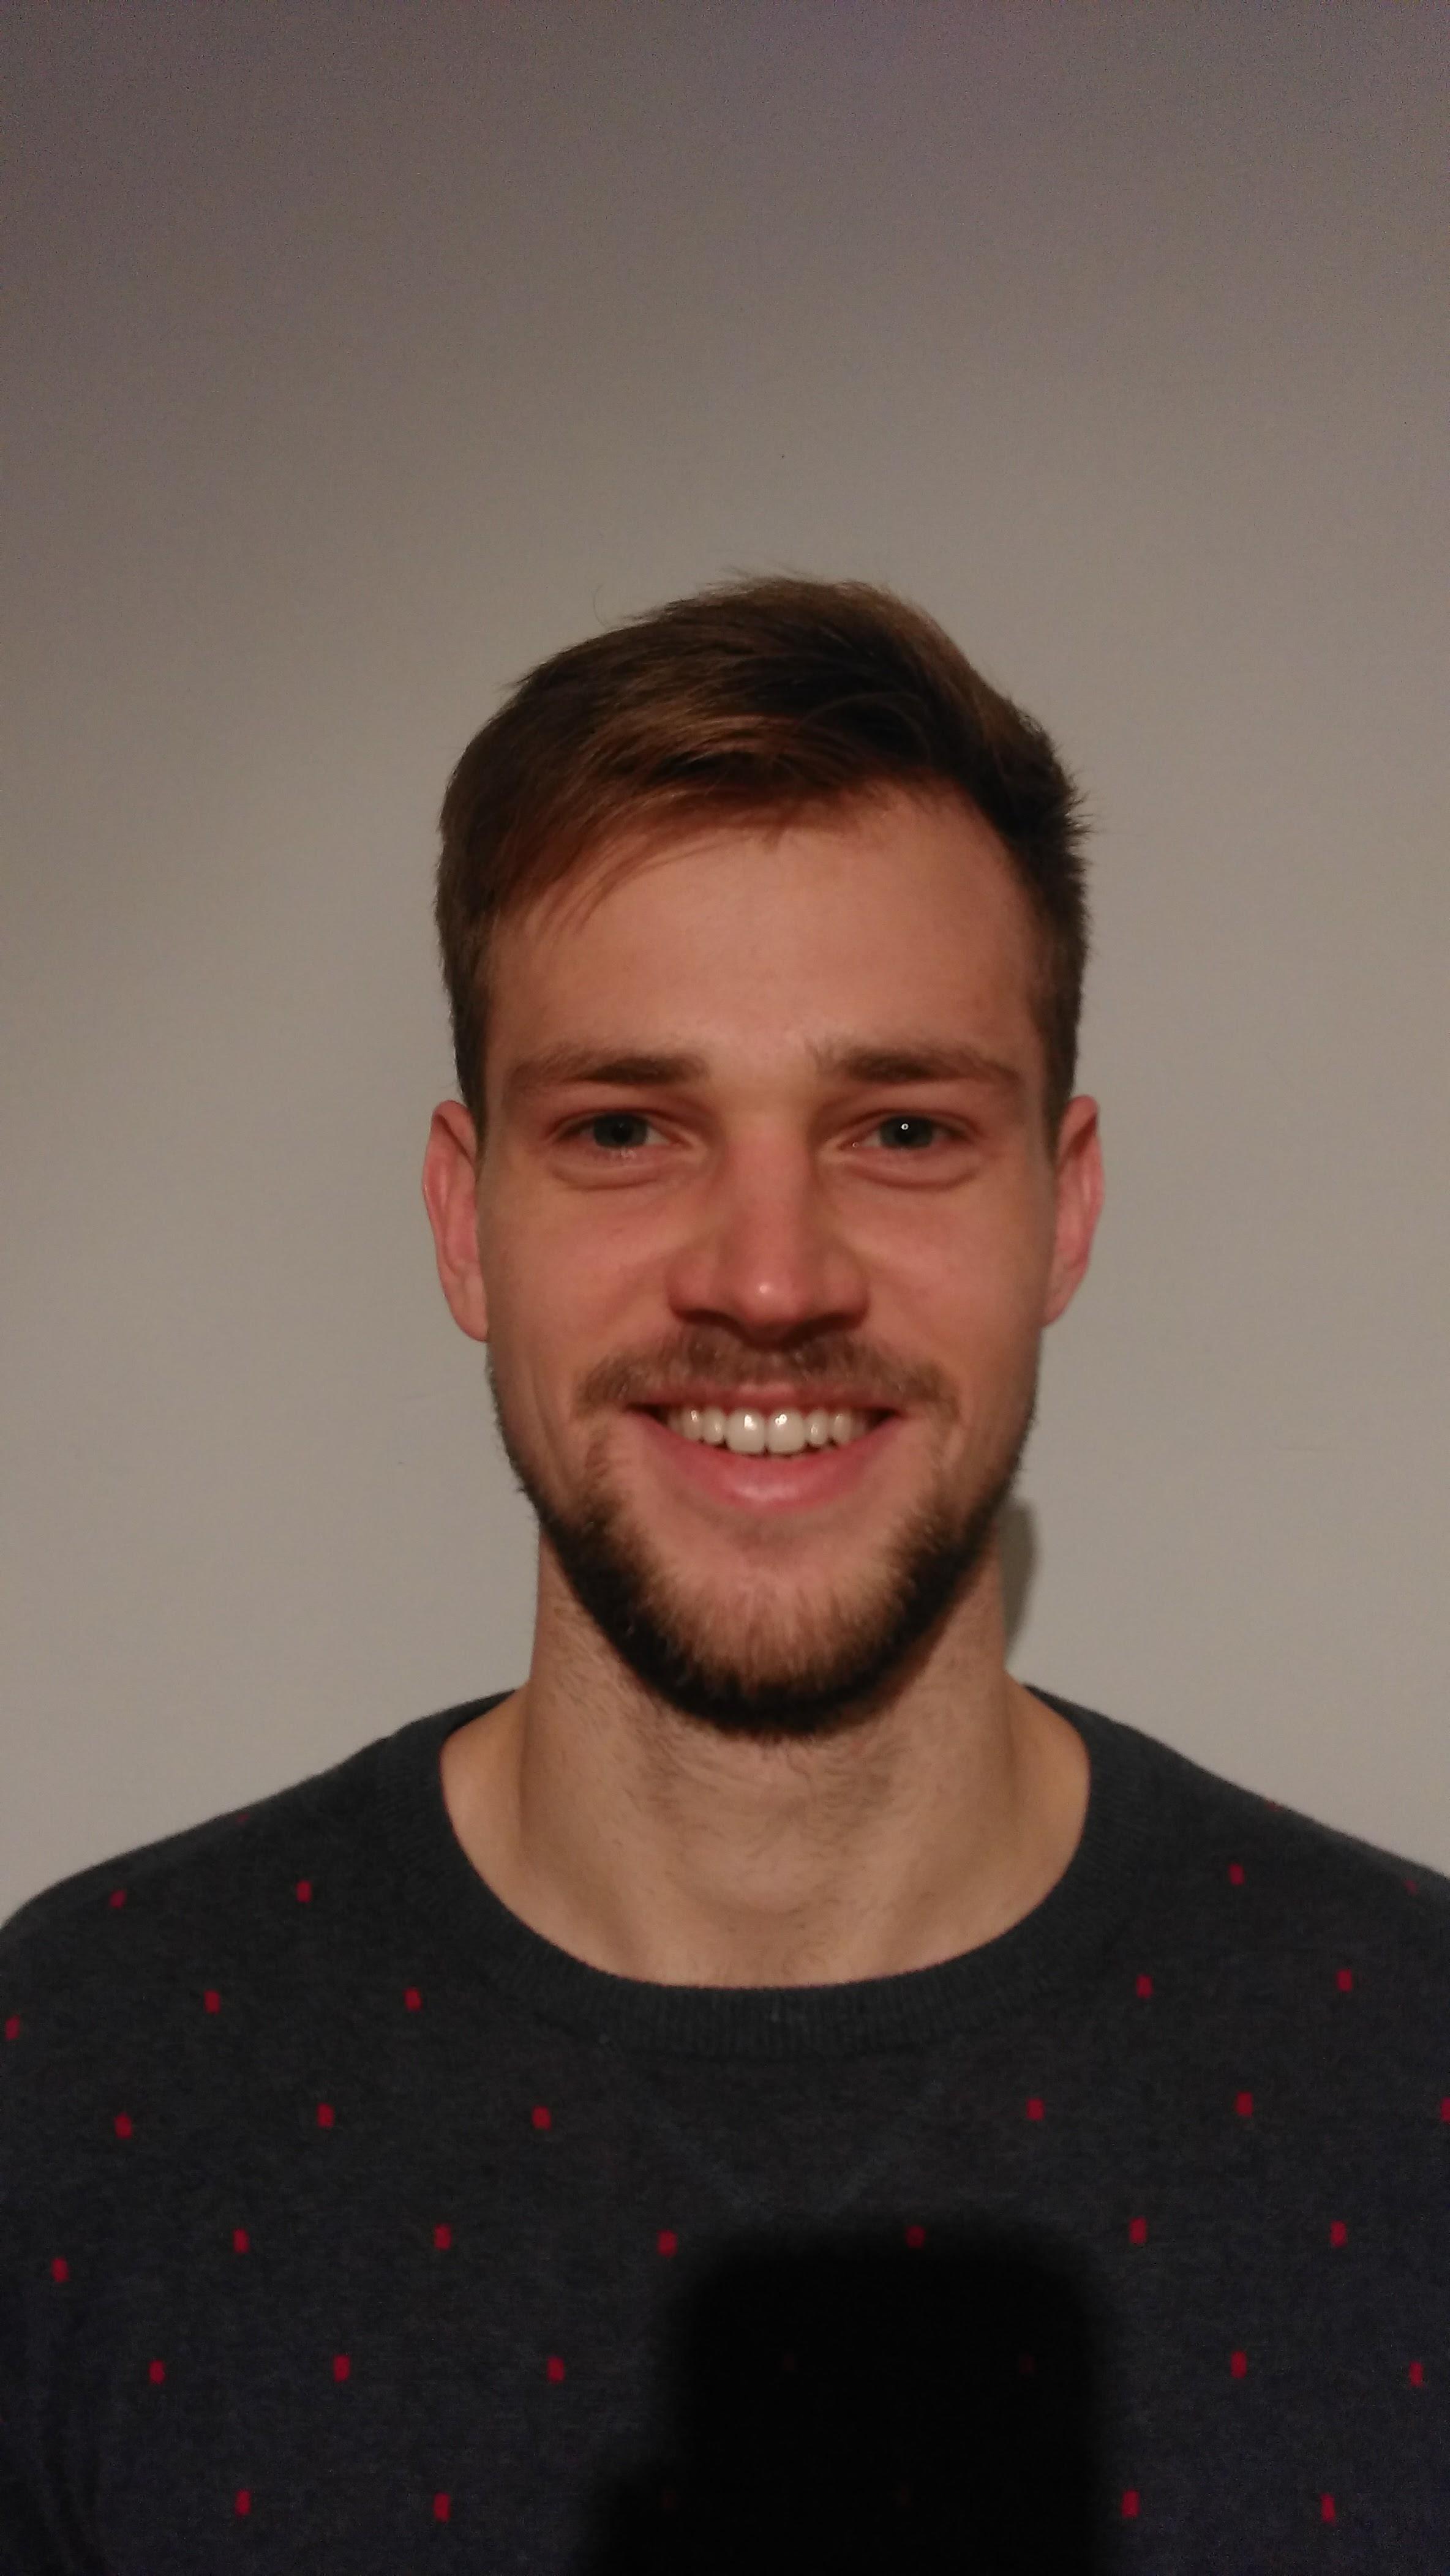 Jan Münster